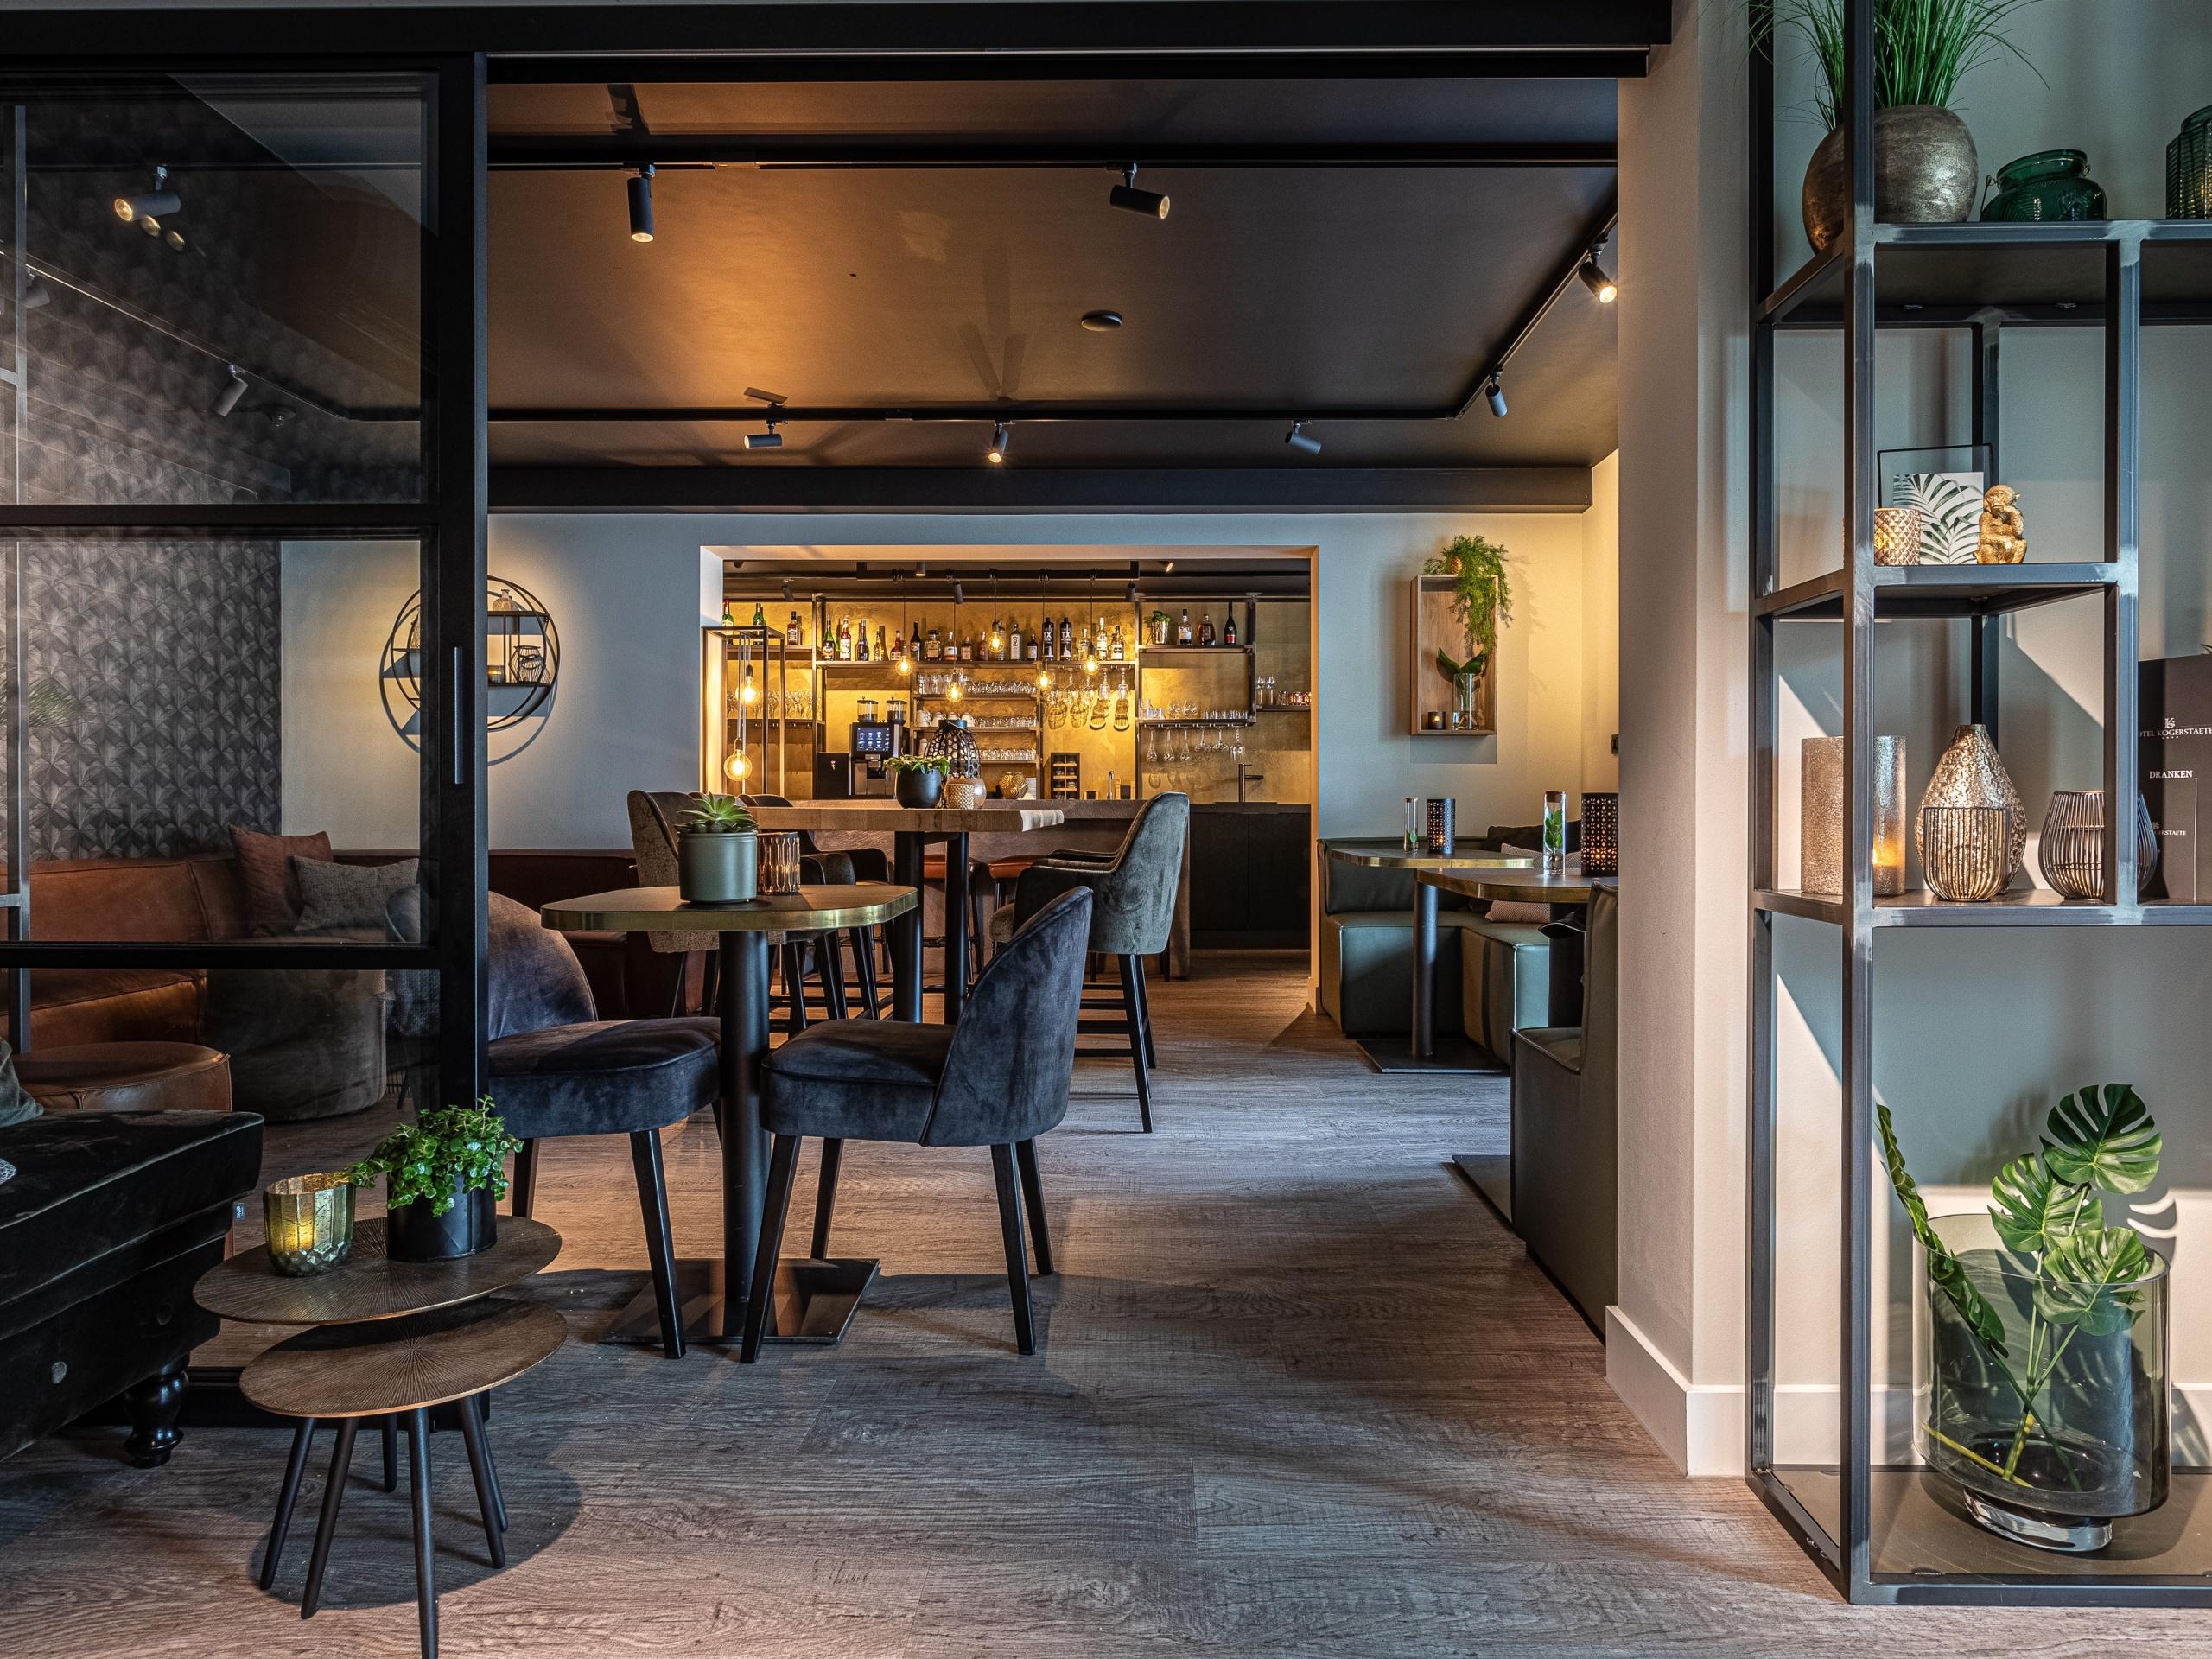 Four-star hotel a few minutes' walk from the beach in De Koog